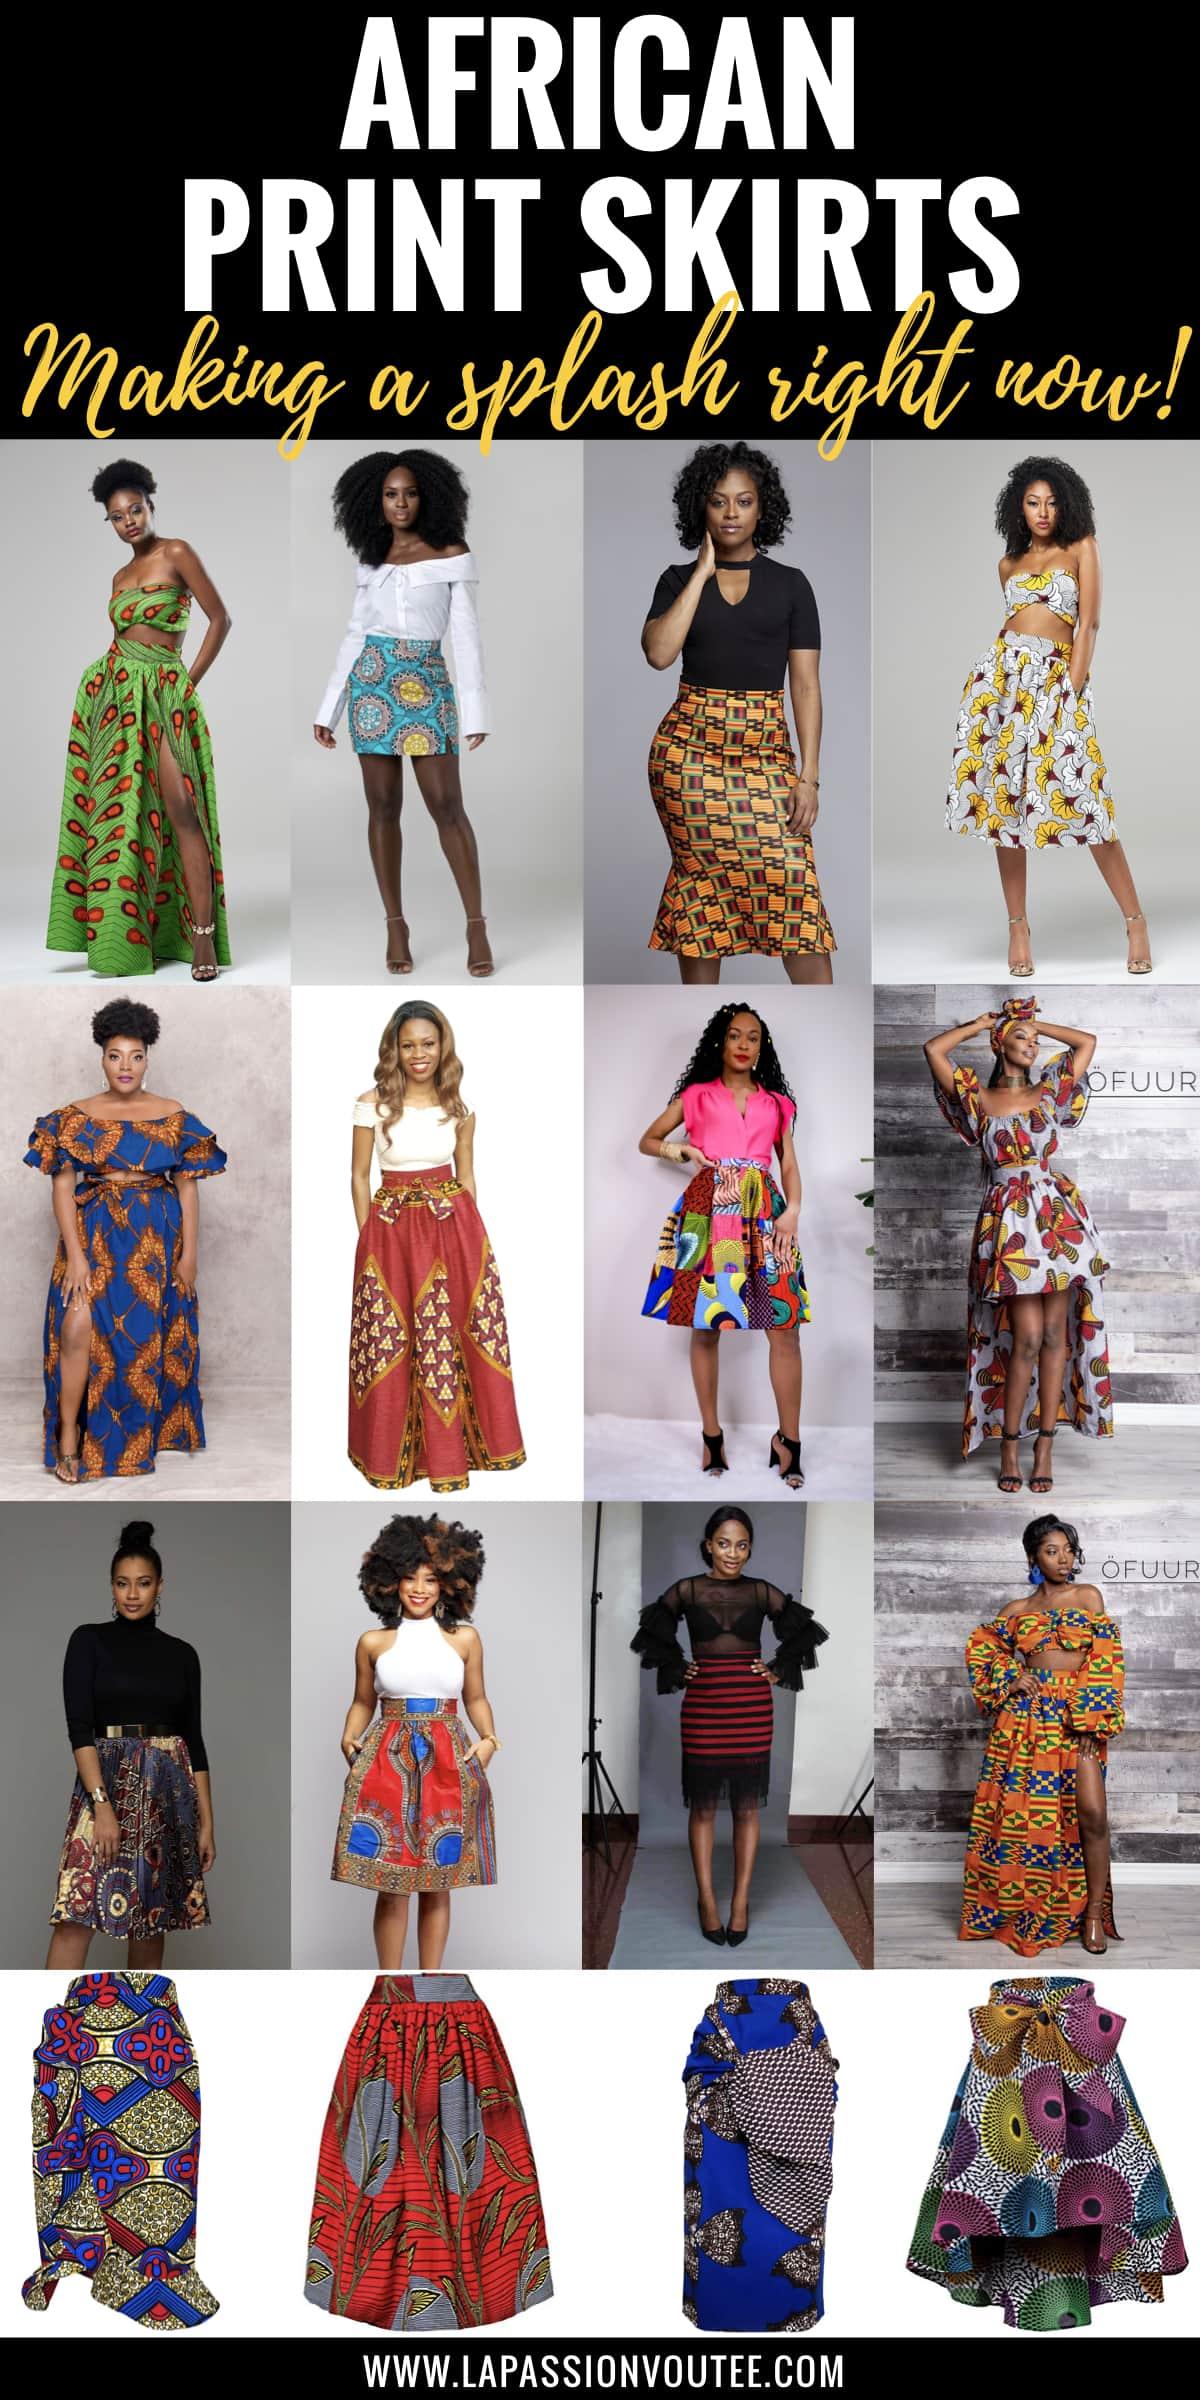 African Skirts Patterns : african, skirts, patterns, Hottest, African, Print, Skirts, Women, Where